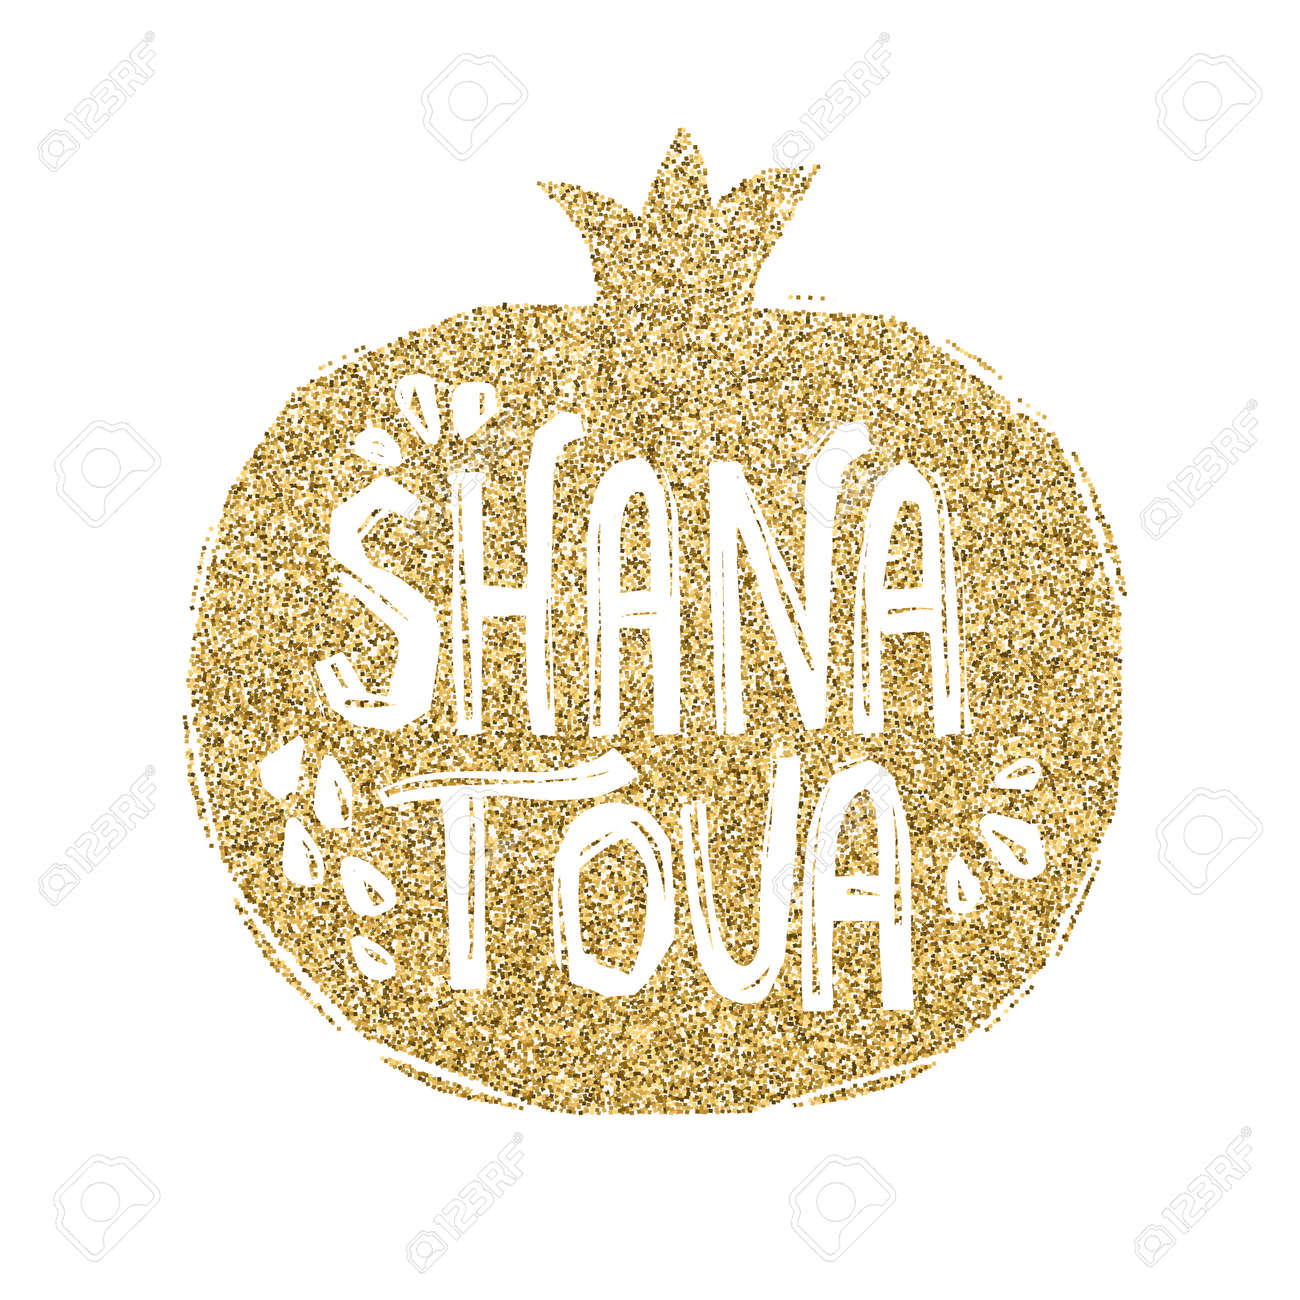 Rosh hashanah greeting card with pomegranate shana tova or jewish rosh hashanah greeting card with pomegranate shana tova or jewish new year symbols stock m4hsunfo